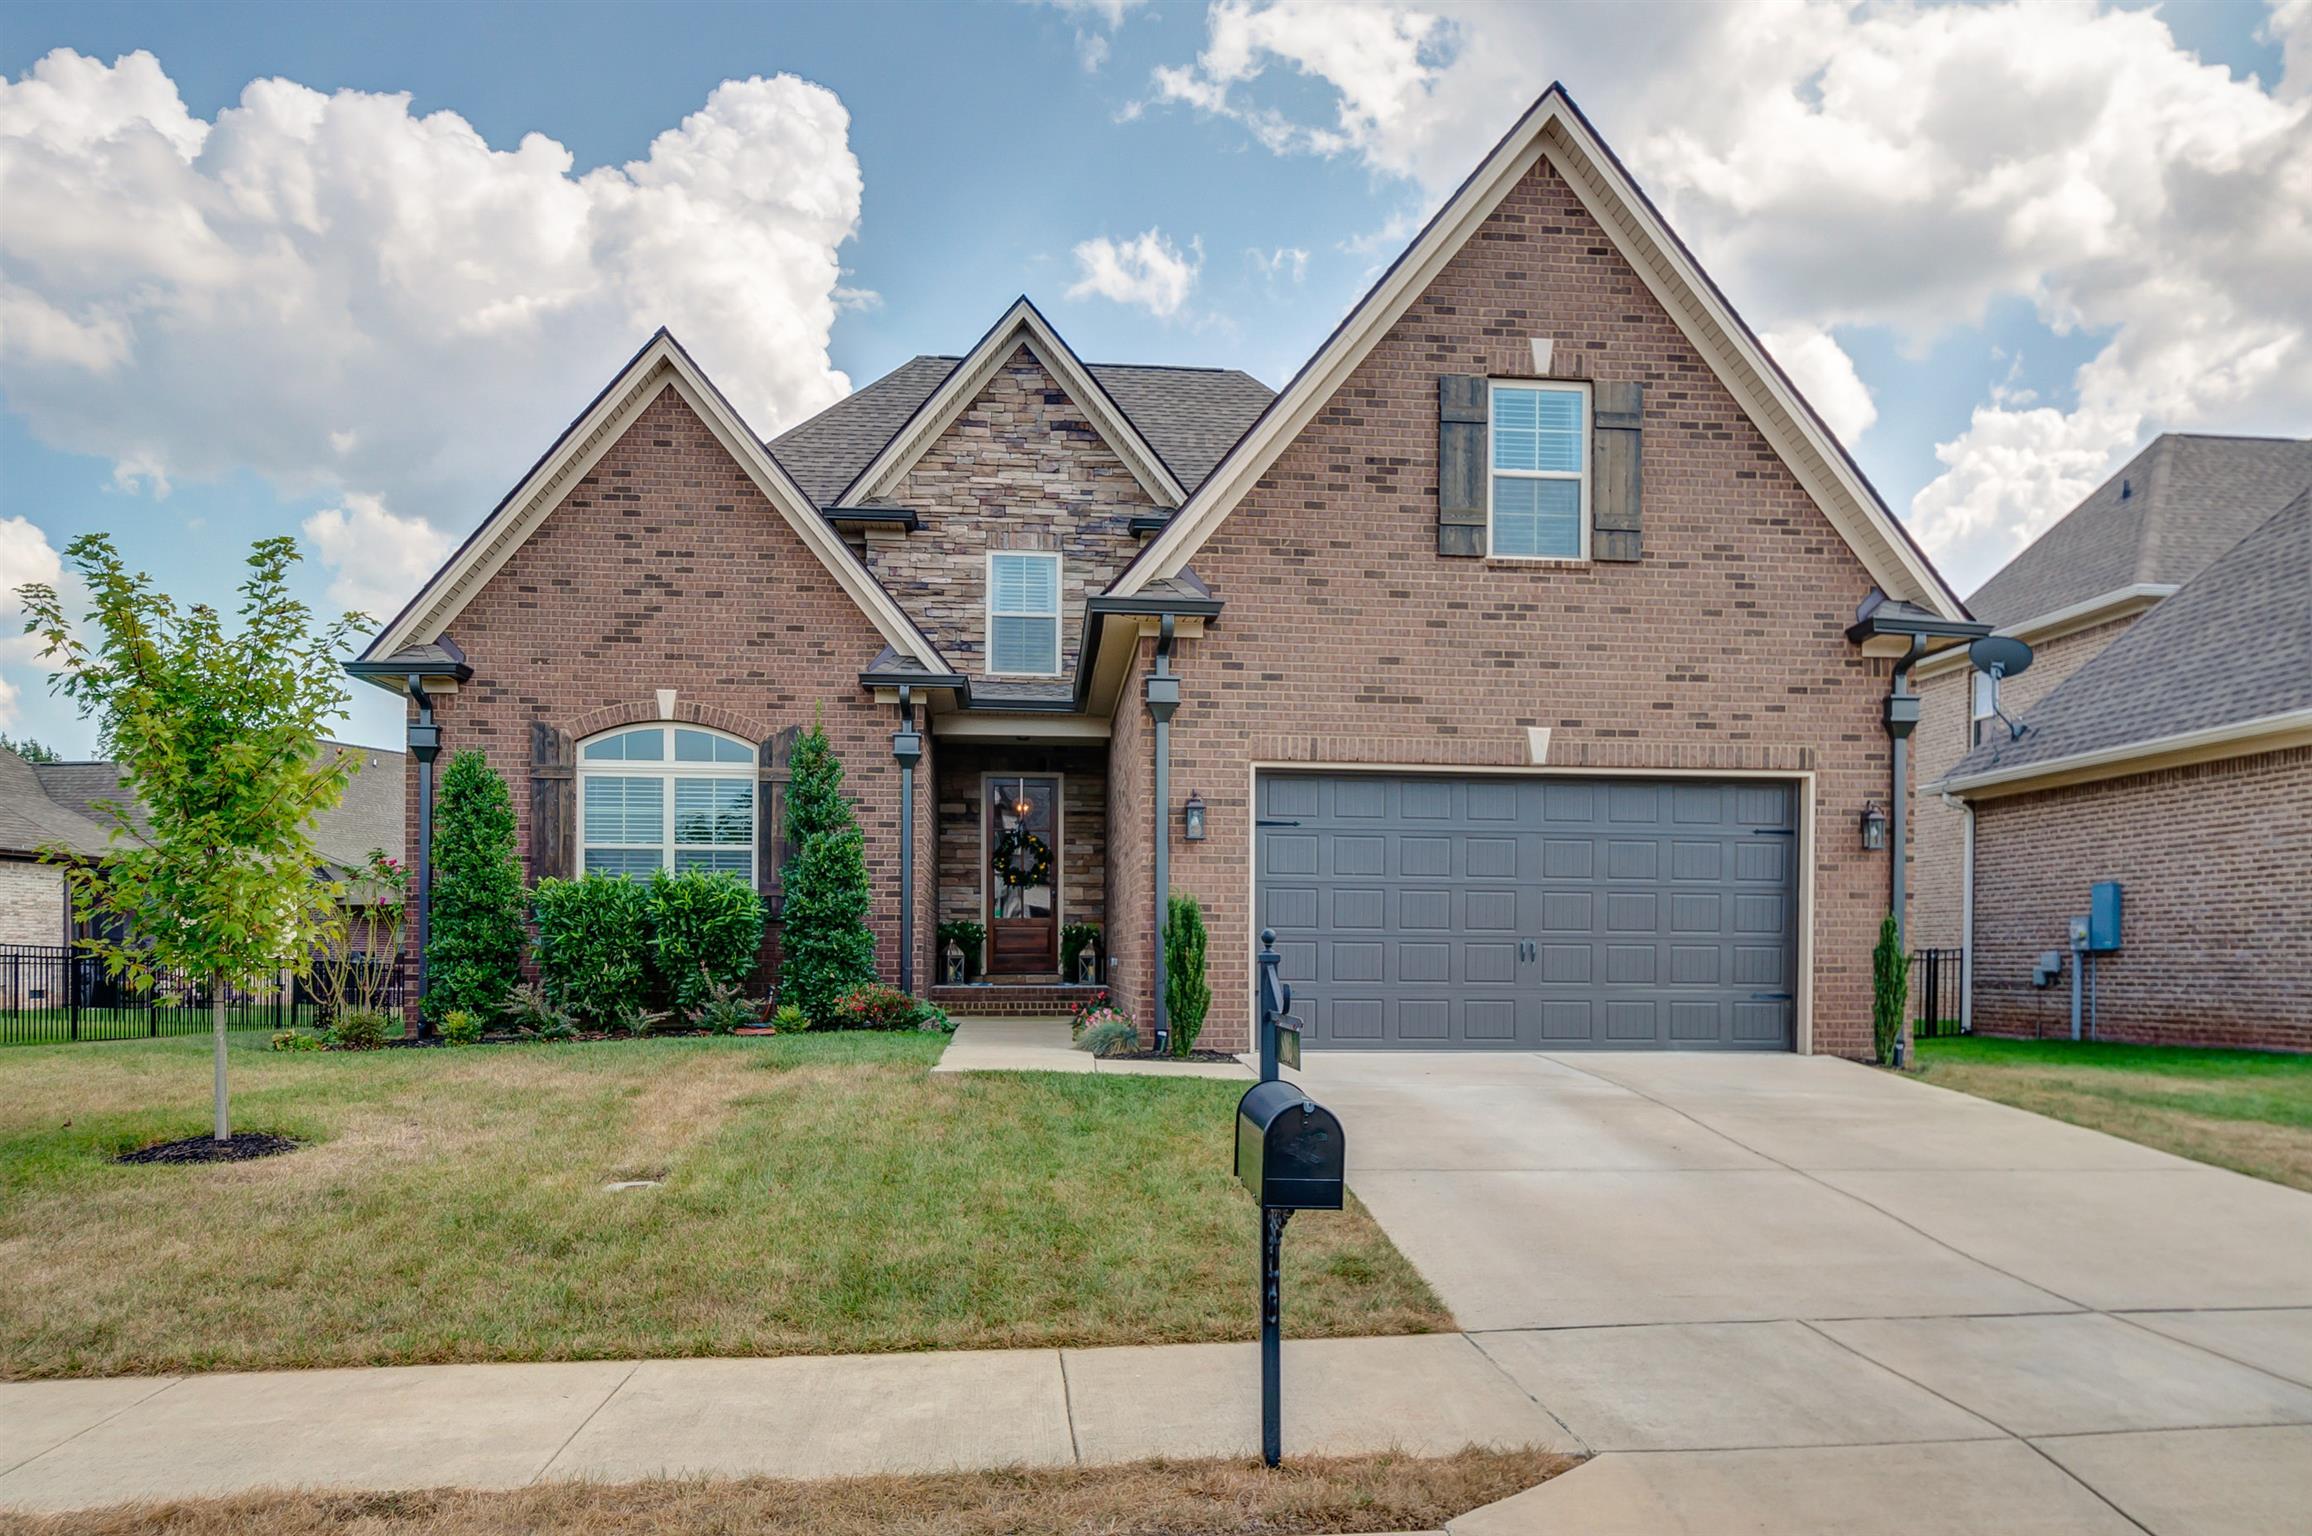 8003 June Apple Lane, Spring Hill, TN 37174 - Spring Hill, TN real estate listing